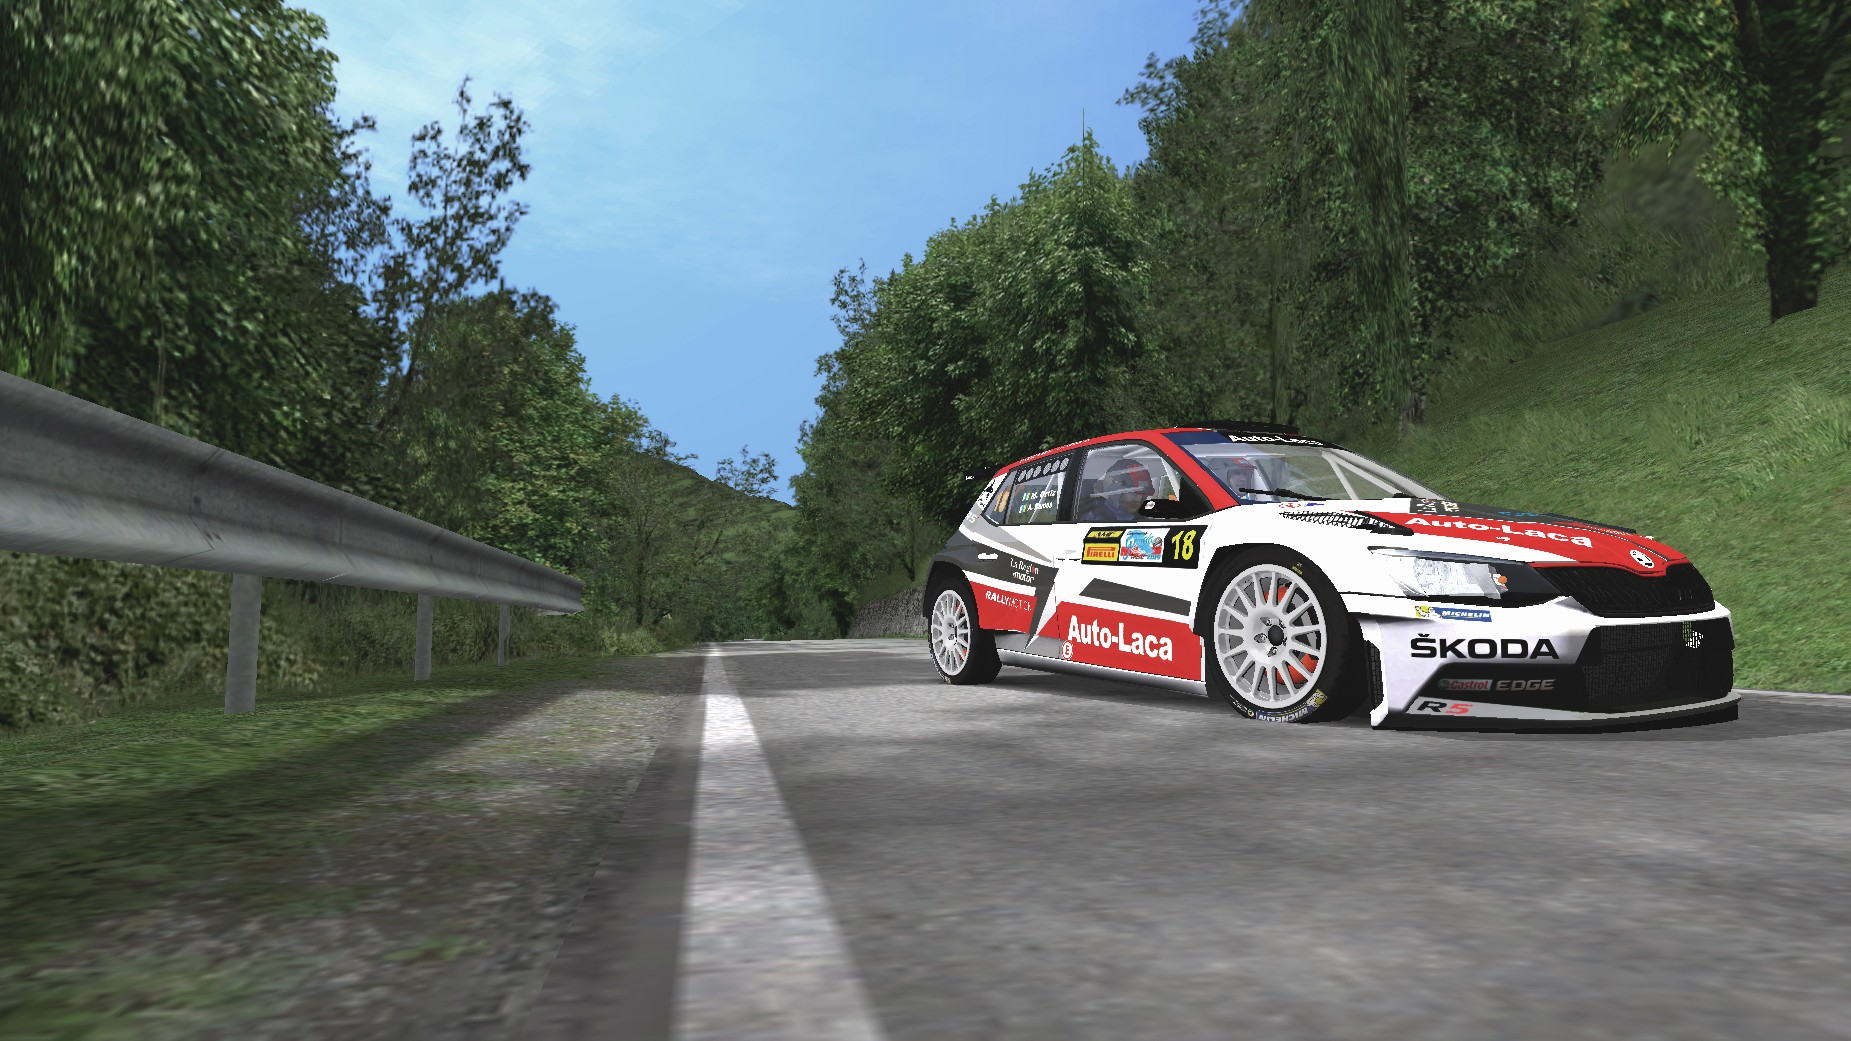 2. CGRV - Rallye De Noia - Página 2 JrhHQ7